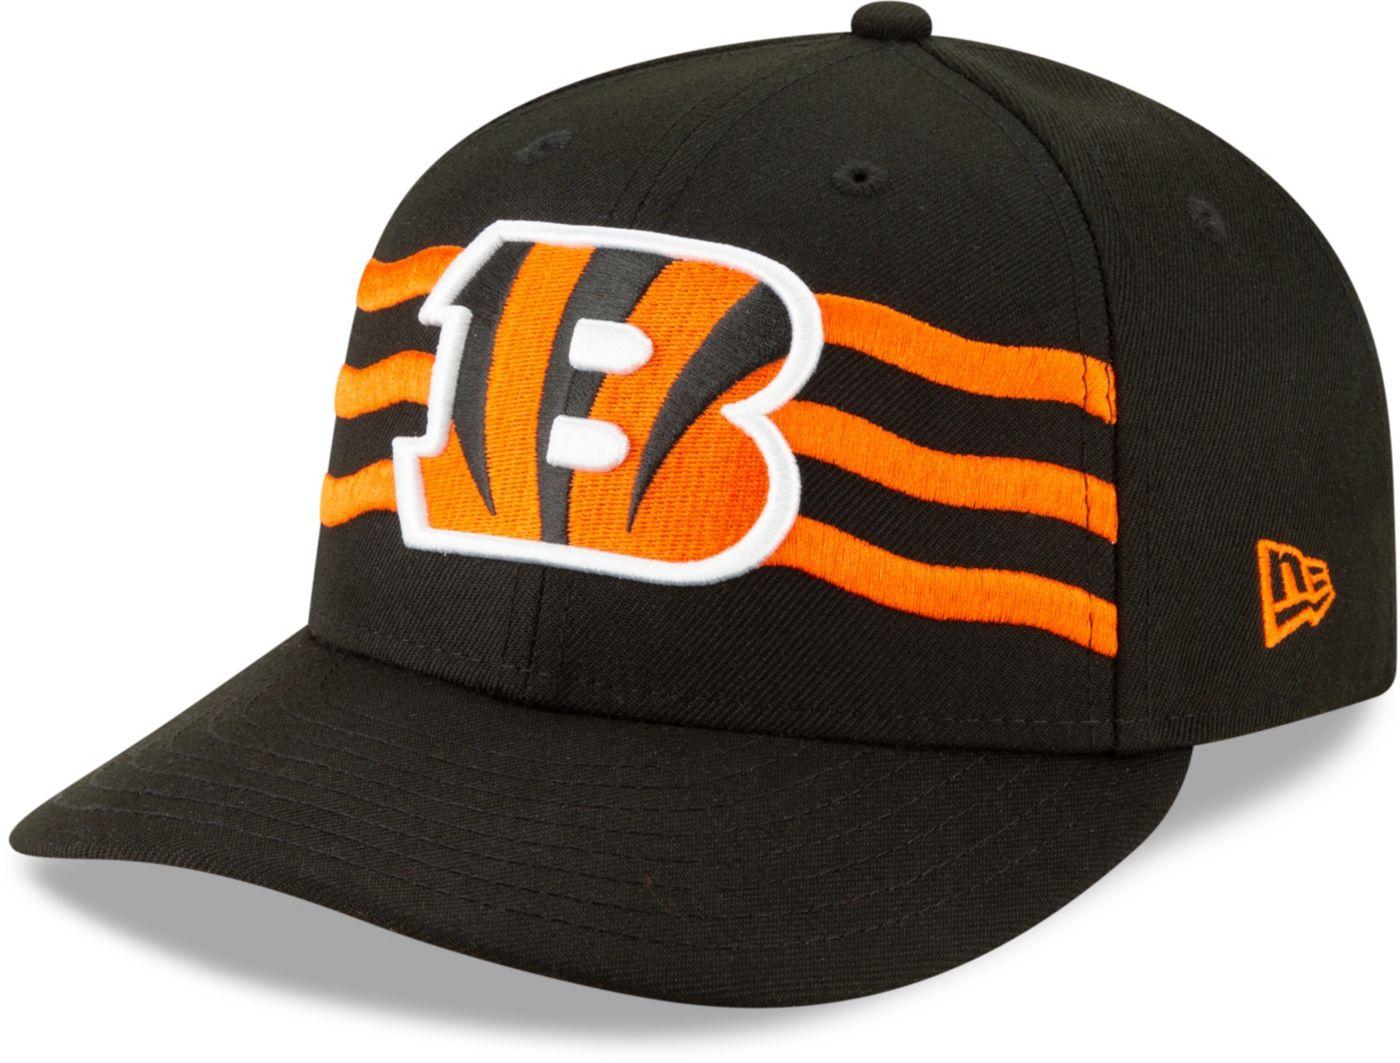 New Era Men's Cincinnati Bengals 2019 NFL Draft 59Fifty Fitted Black Hat